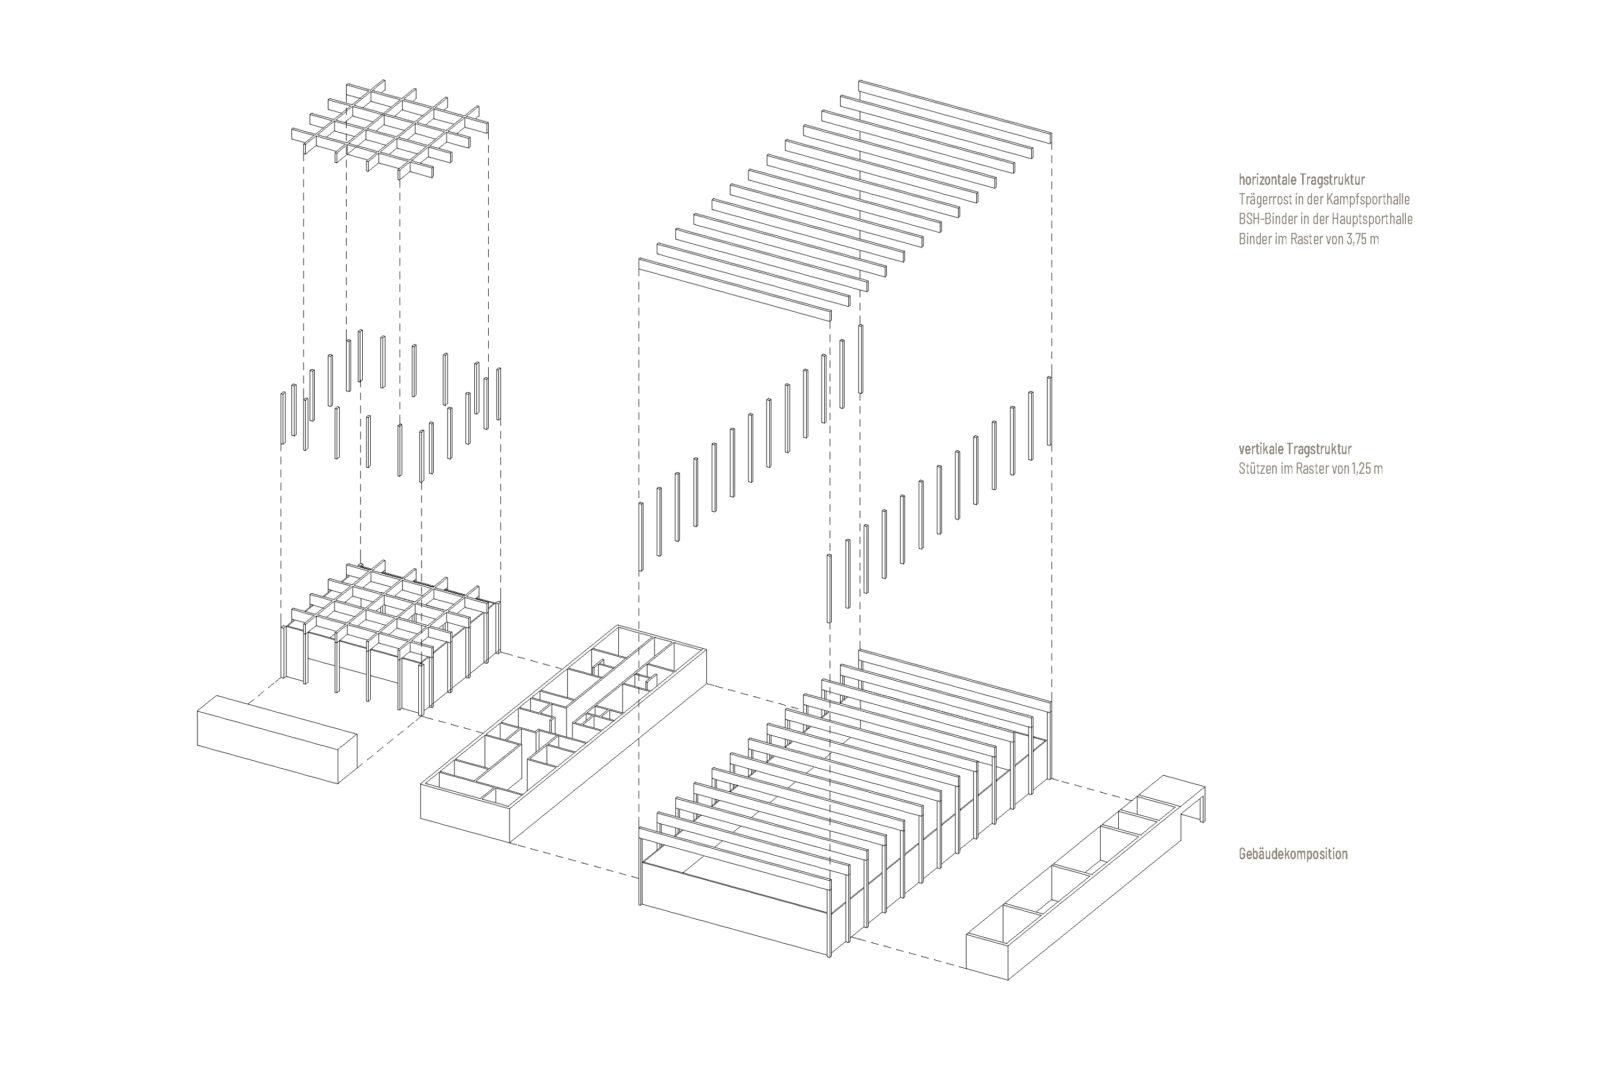 Neubau Sporthalle Pirmasens - Konstruktionsaxometrie